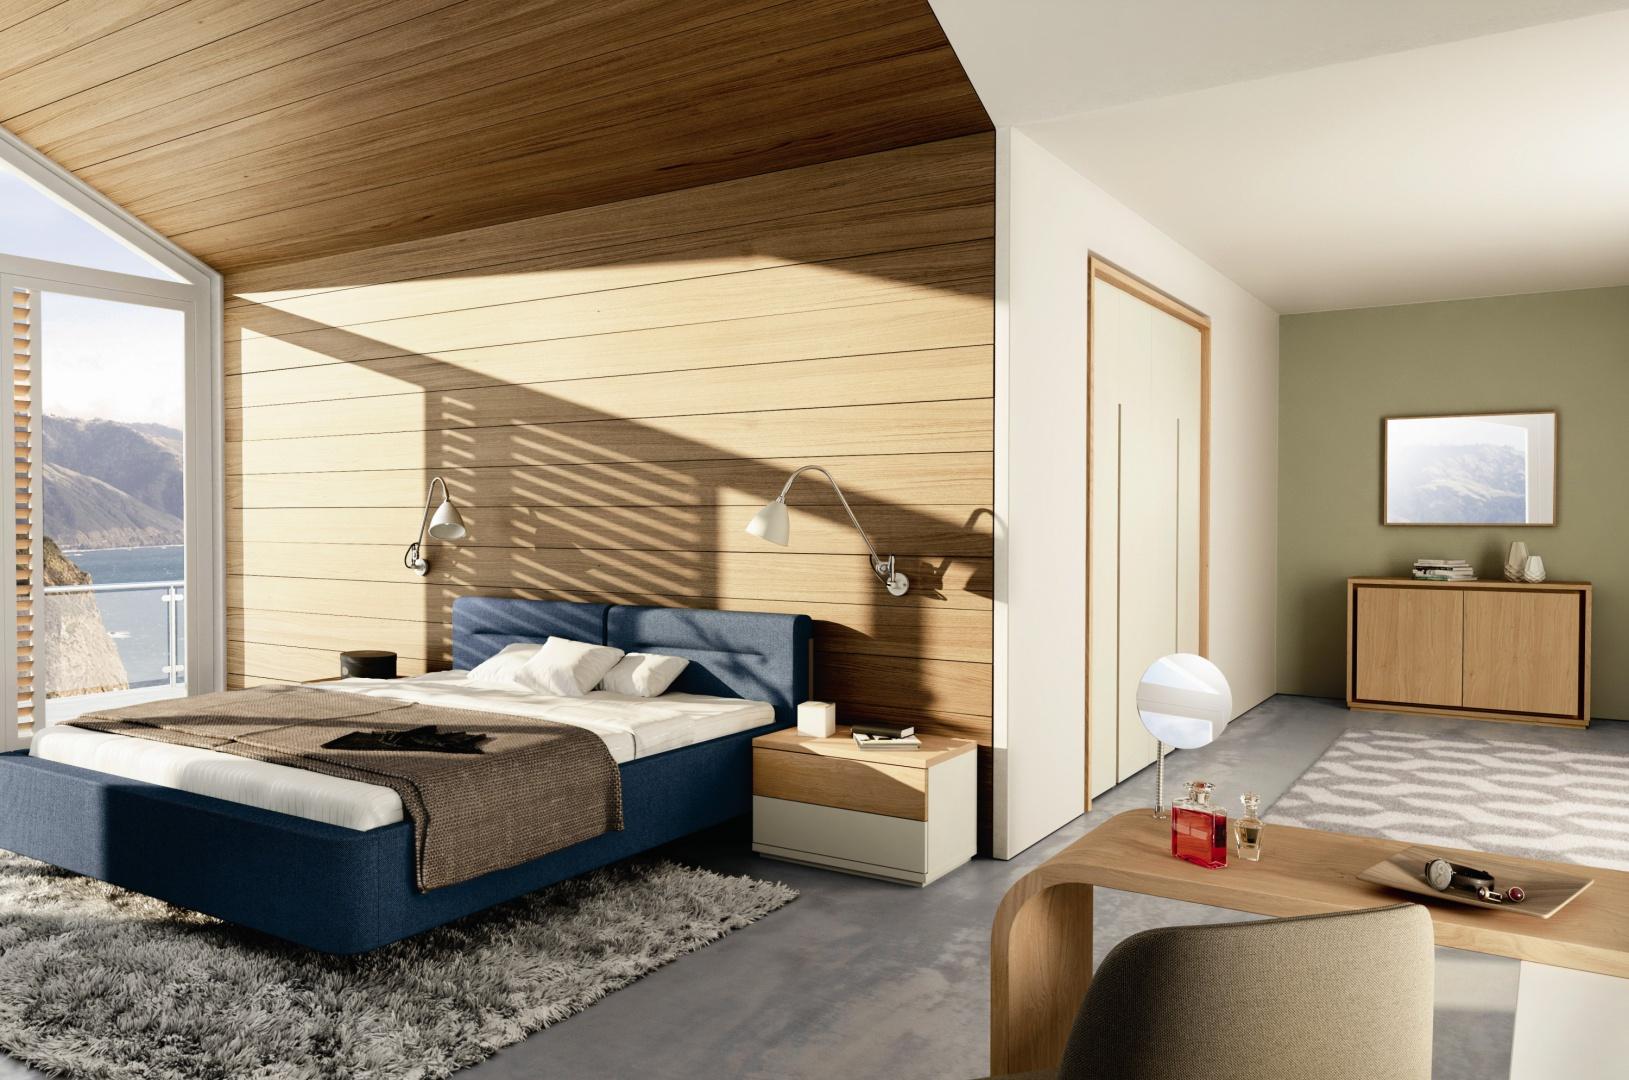 bia e meble ocieplone drewnem zobacz propozycje do sypialni galeria. Black Bedroom Furniture Sets. Home Design Ideas